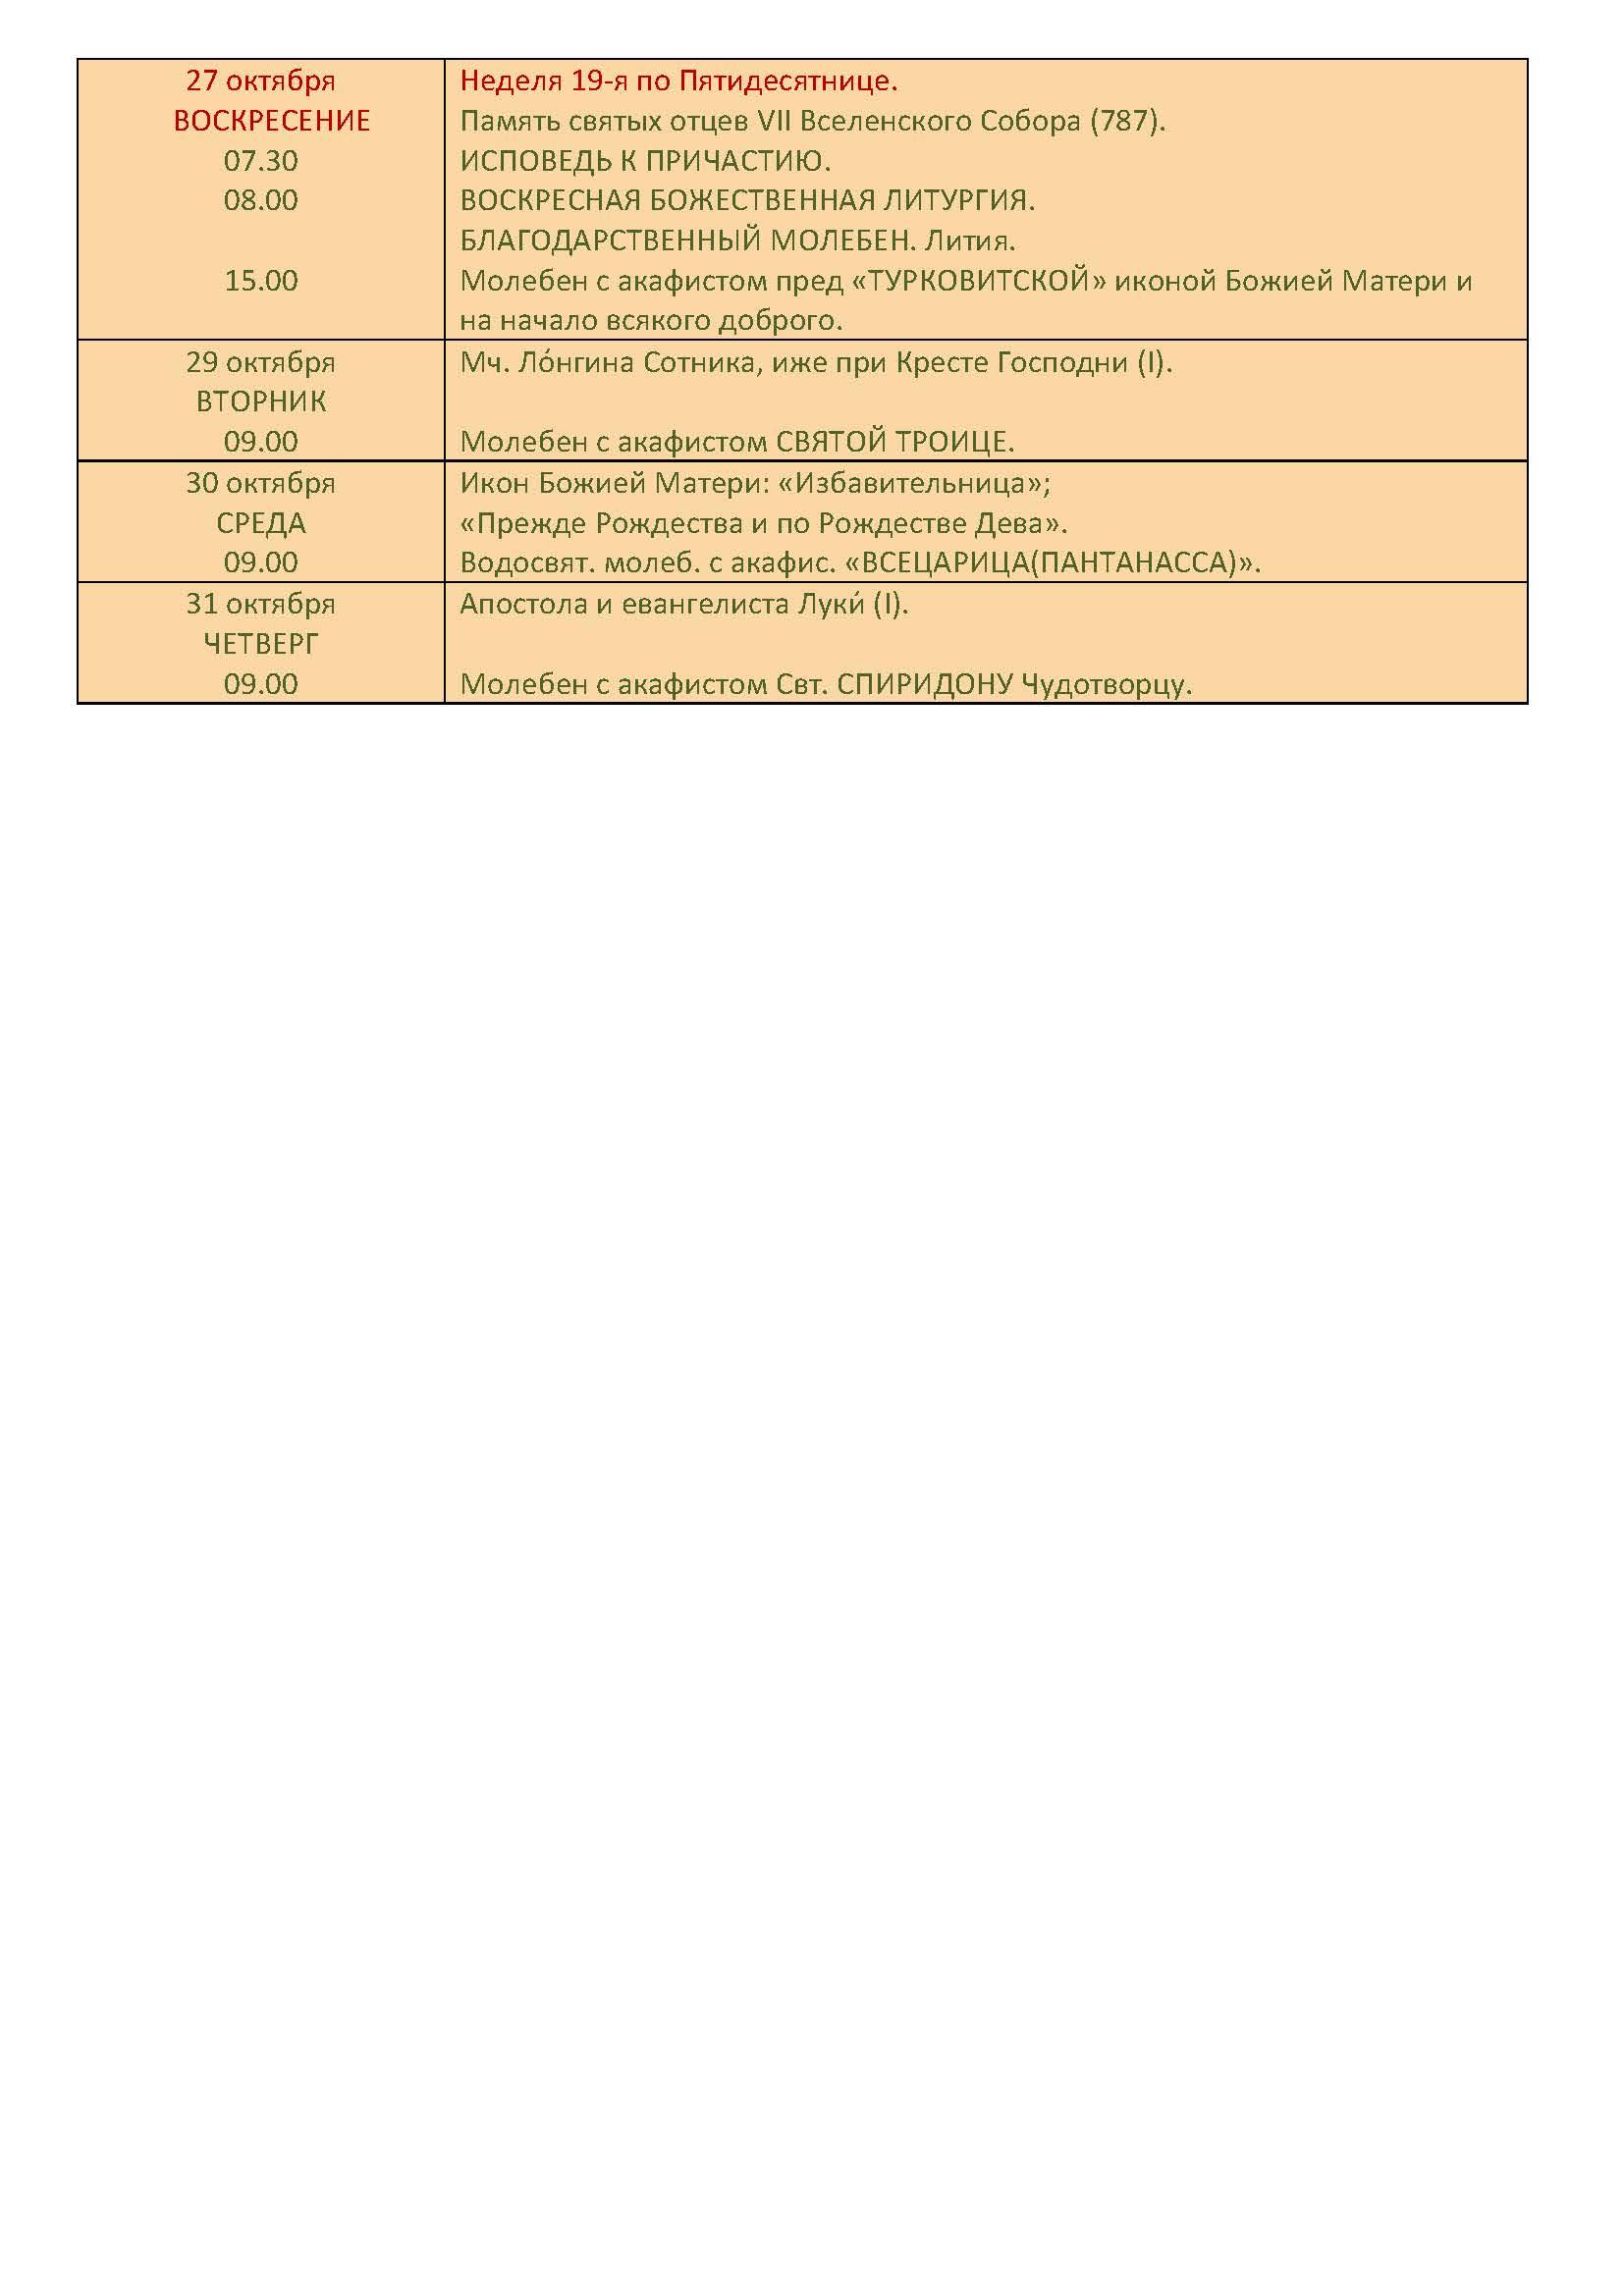 10 график служб на октябрь_Page_3